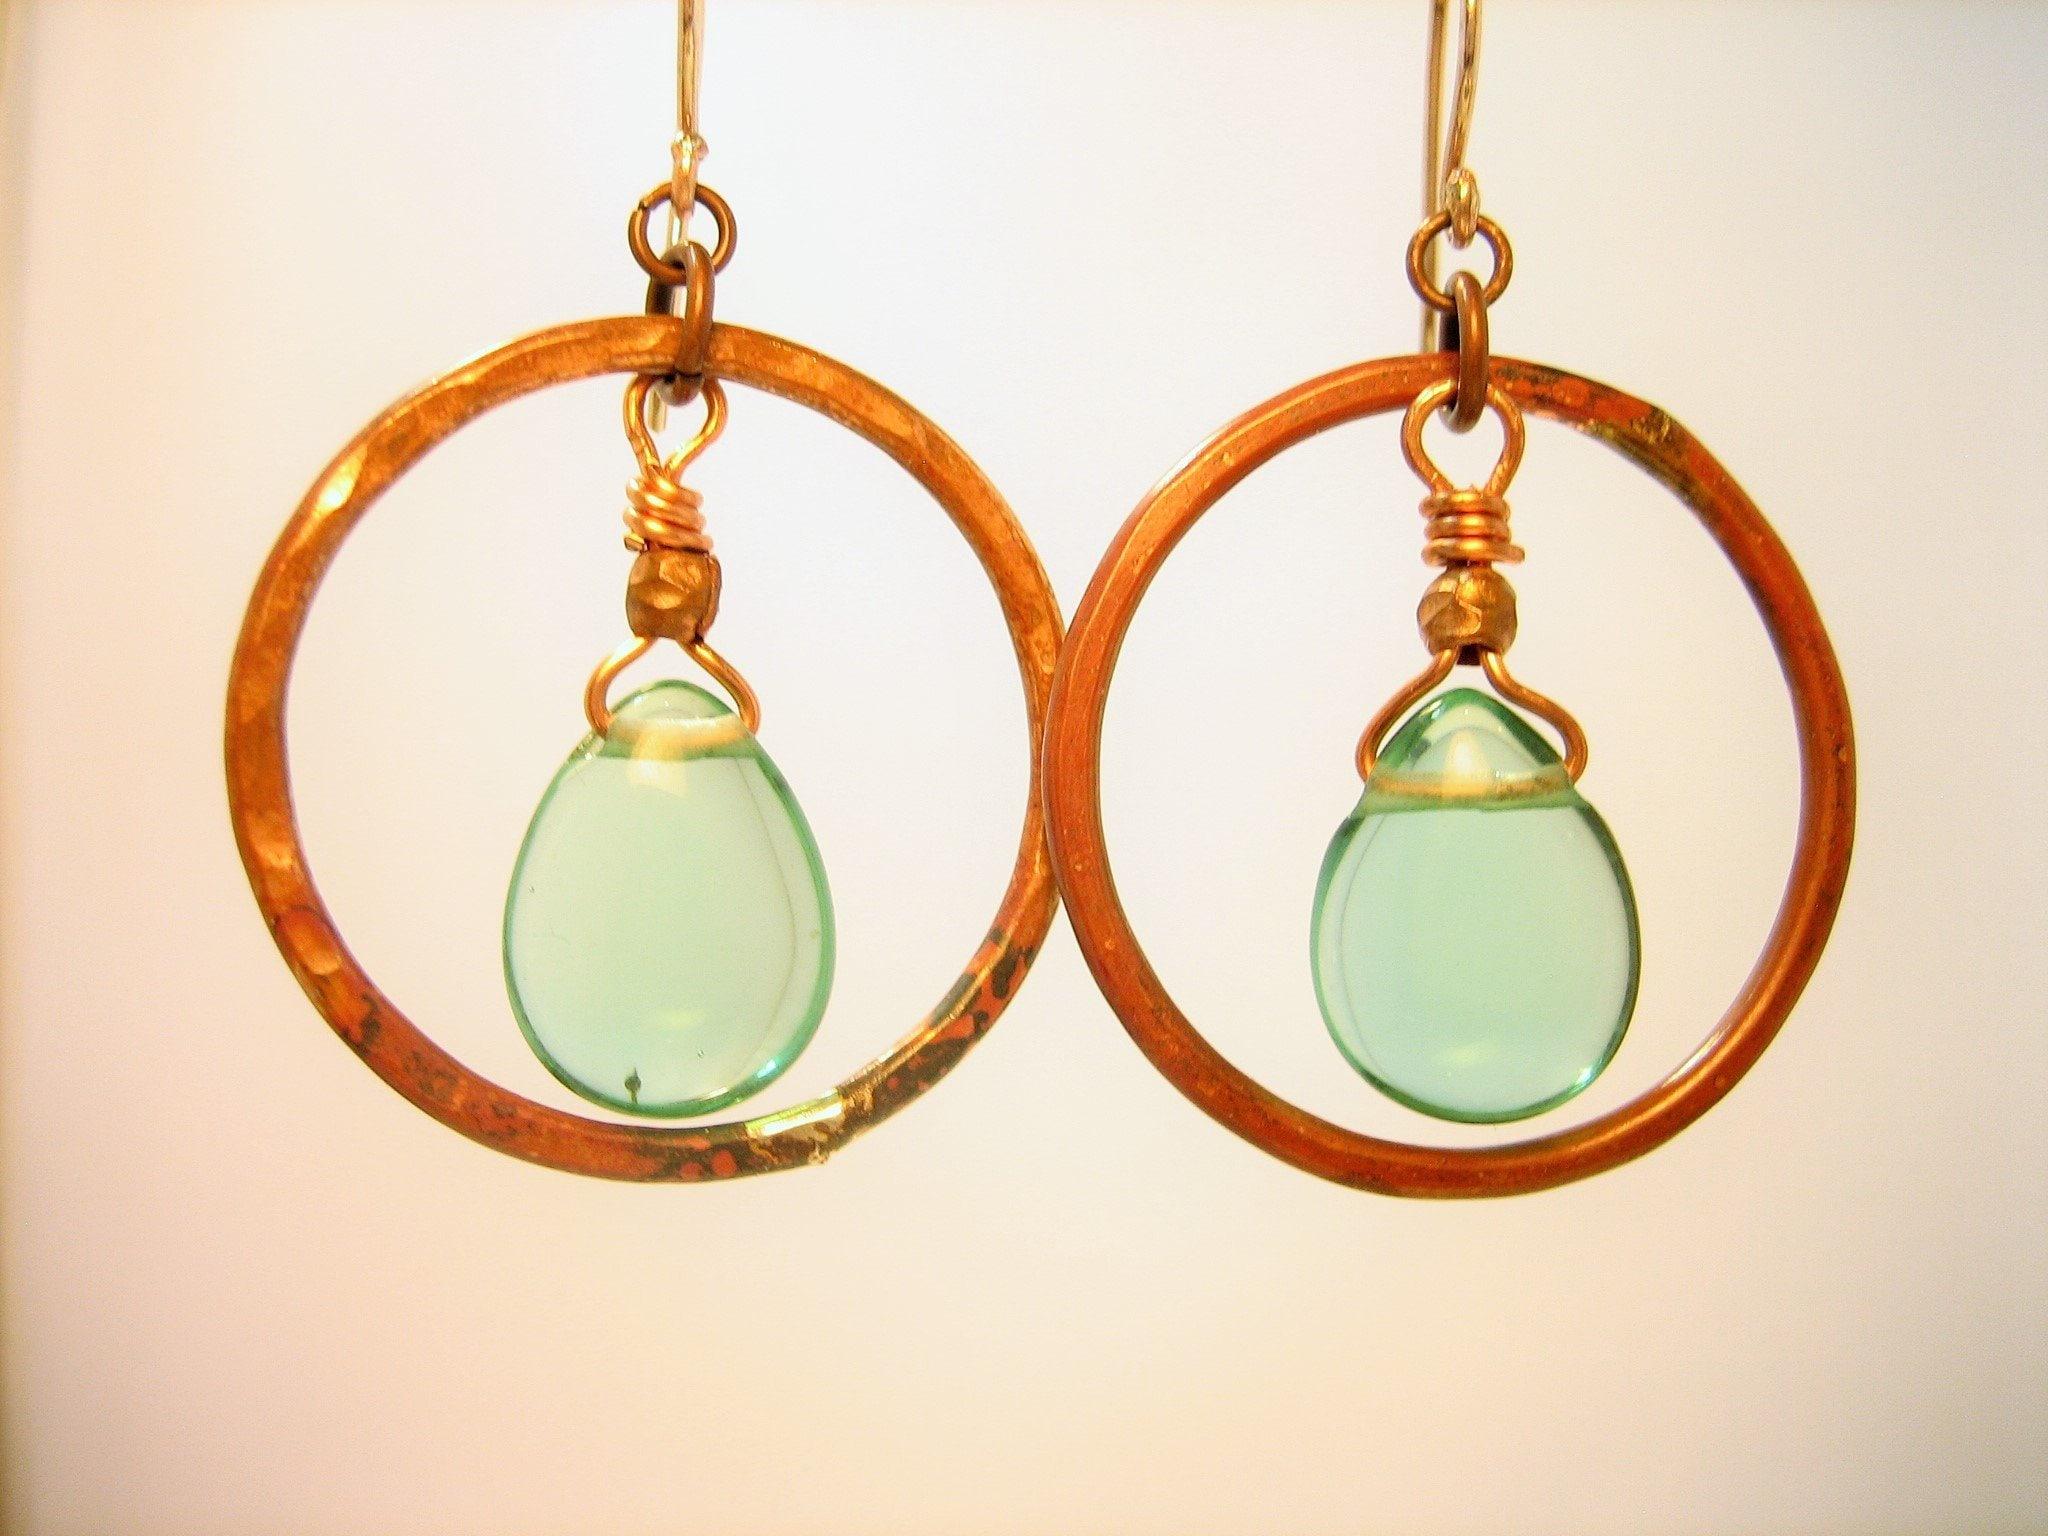 Gypsy hoop hammered copper earrings with aqua green quartz genuine gemstone-dangle open circle artisan handmade hammered copper earrings